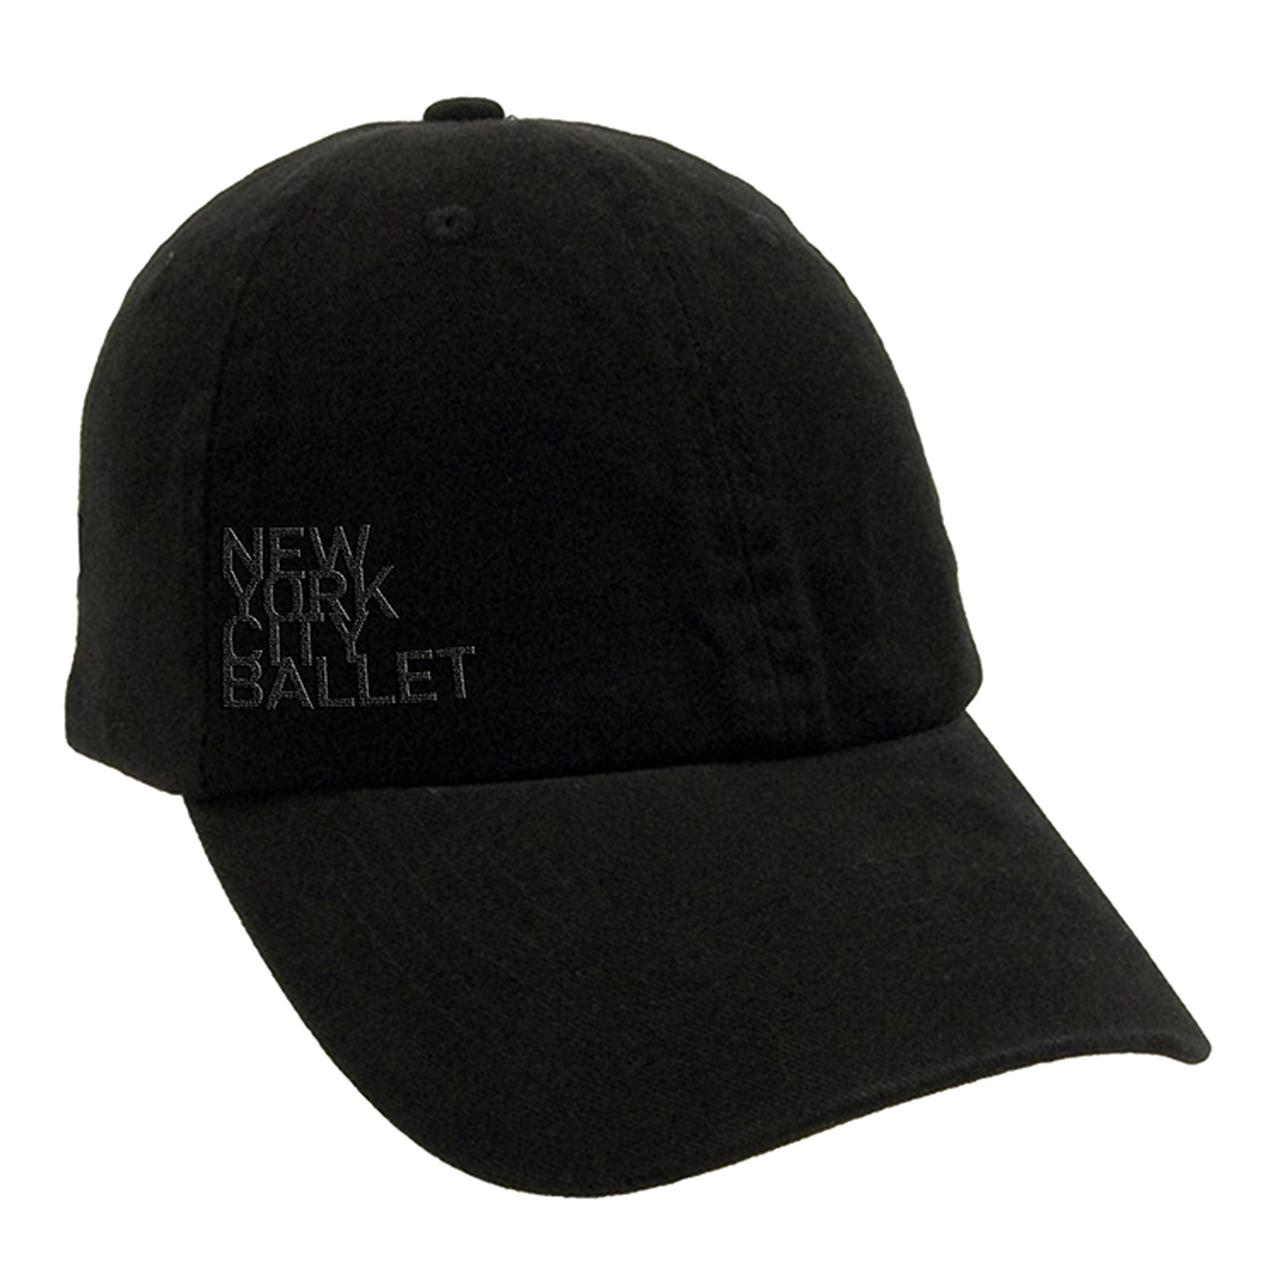 NYC Ballet Black Logo Baseball Cap 3bae7ce9cb5